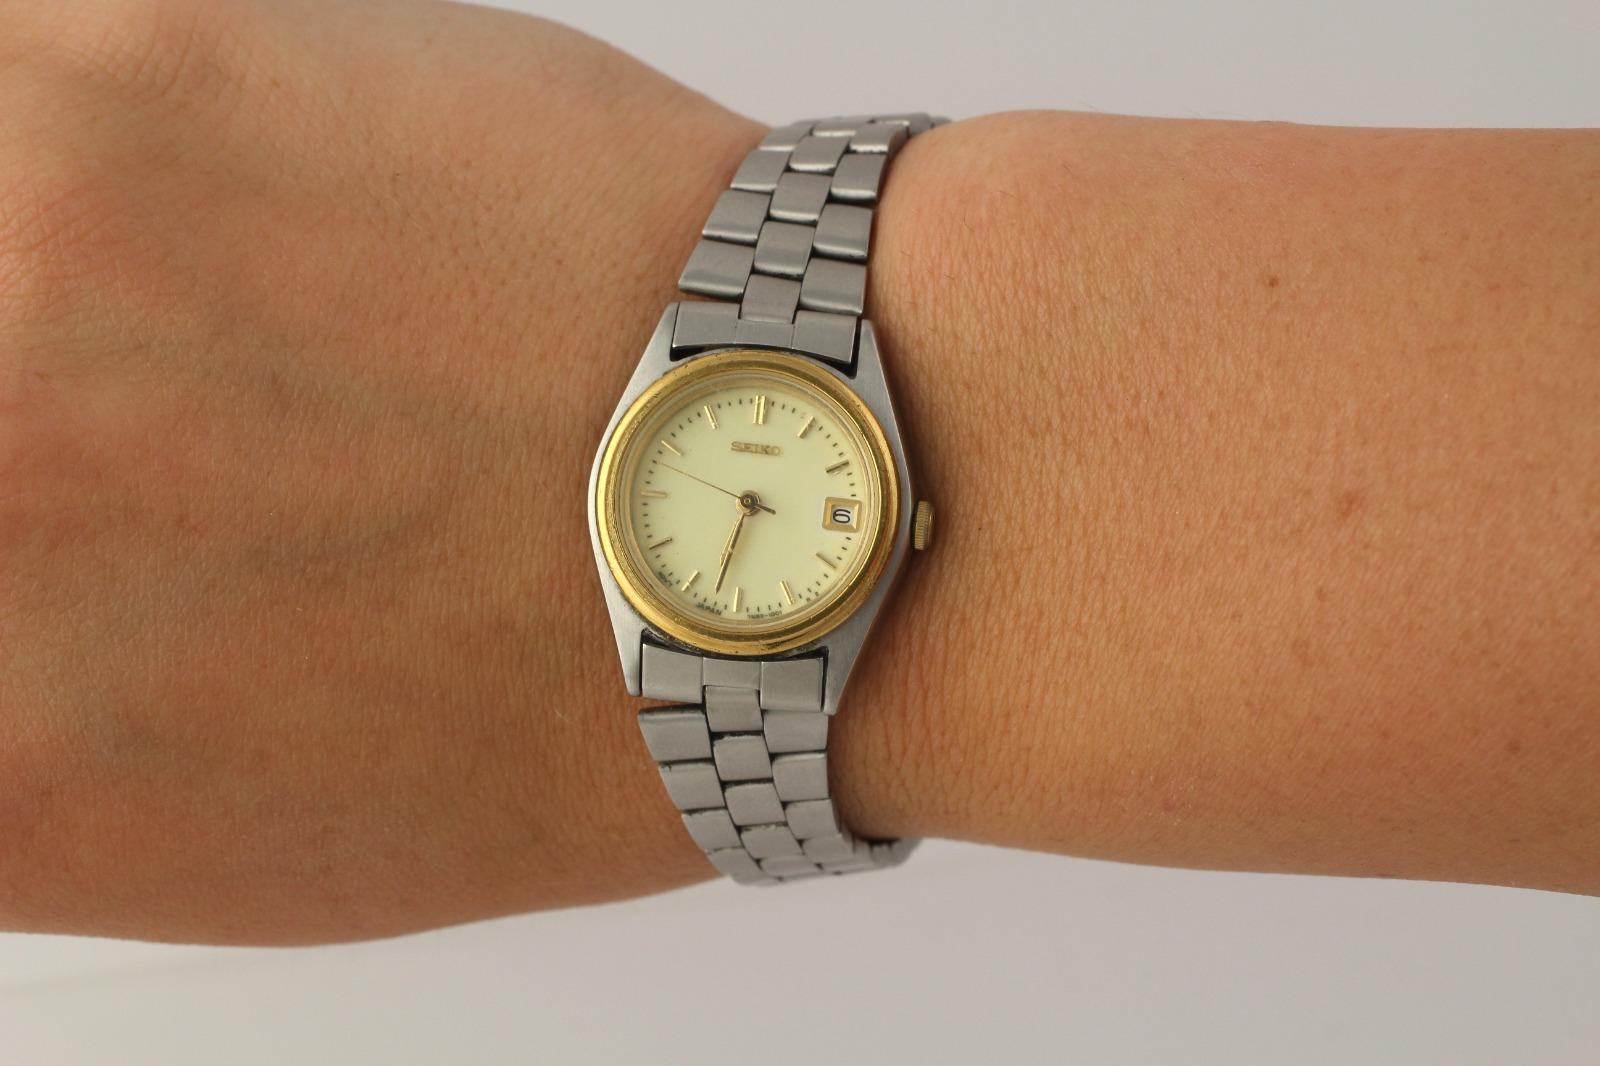 femmes seiko montre bracelet quartz pile analogique acier inoxydable ebay. Black Bedroom Furniture Sets. Home Design Ideas